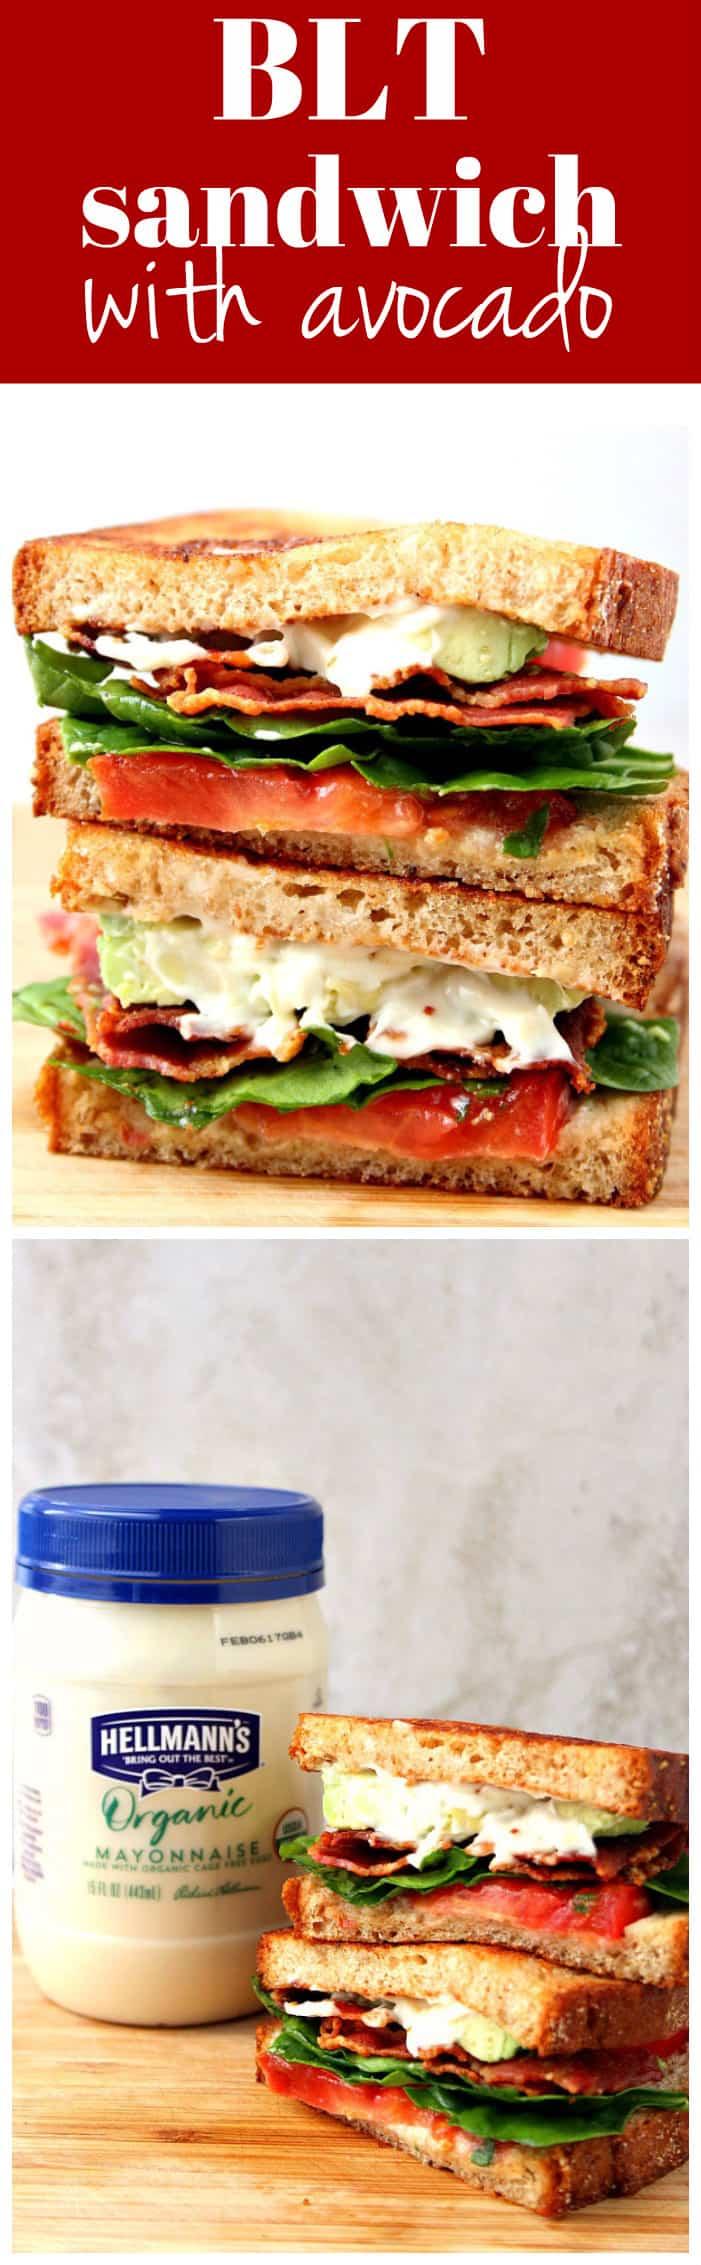 BLT Sandwich with Avocado Recipe long1 BLT Sandwich with Avocado Recipe